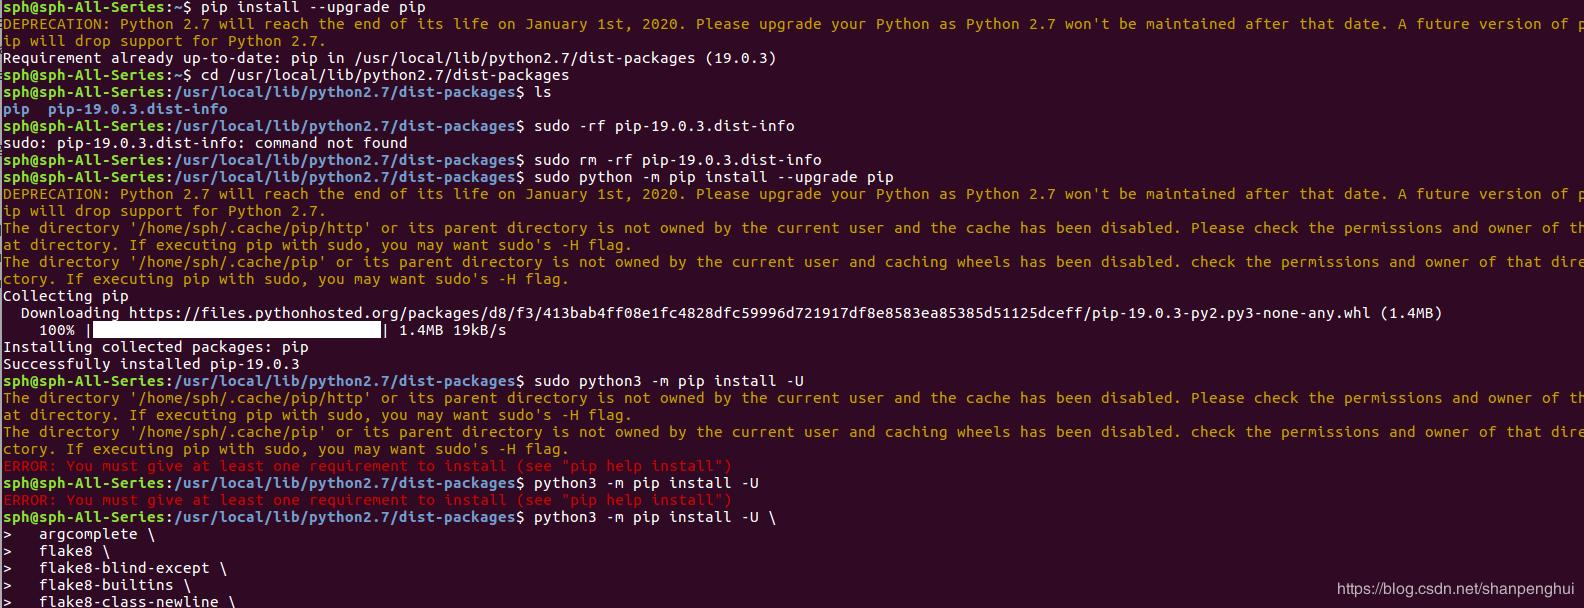 Fix 'python -m pip install --upgrade pip' - Programmer Sought